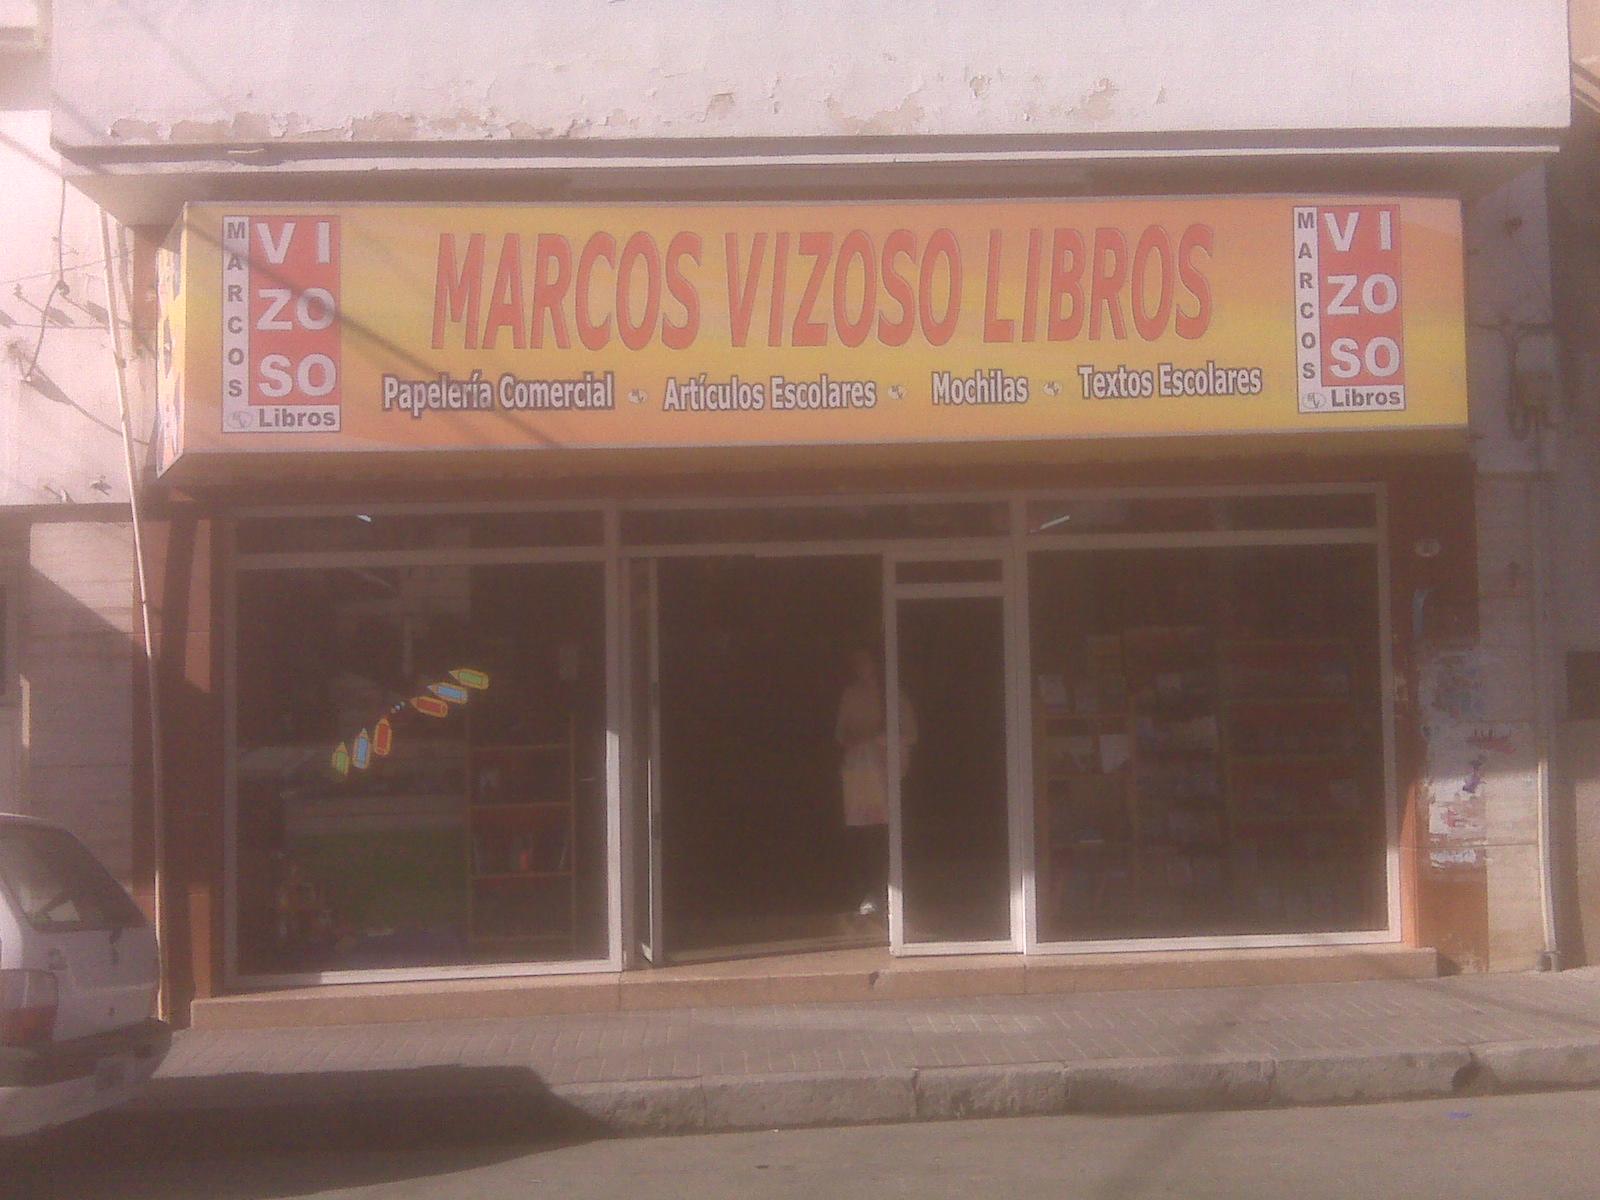 Aquel tiempo de mi infancia marcos vizoso libros hist rica libreria de santiago - Libreria couceiro santiago ...